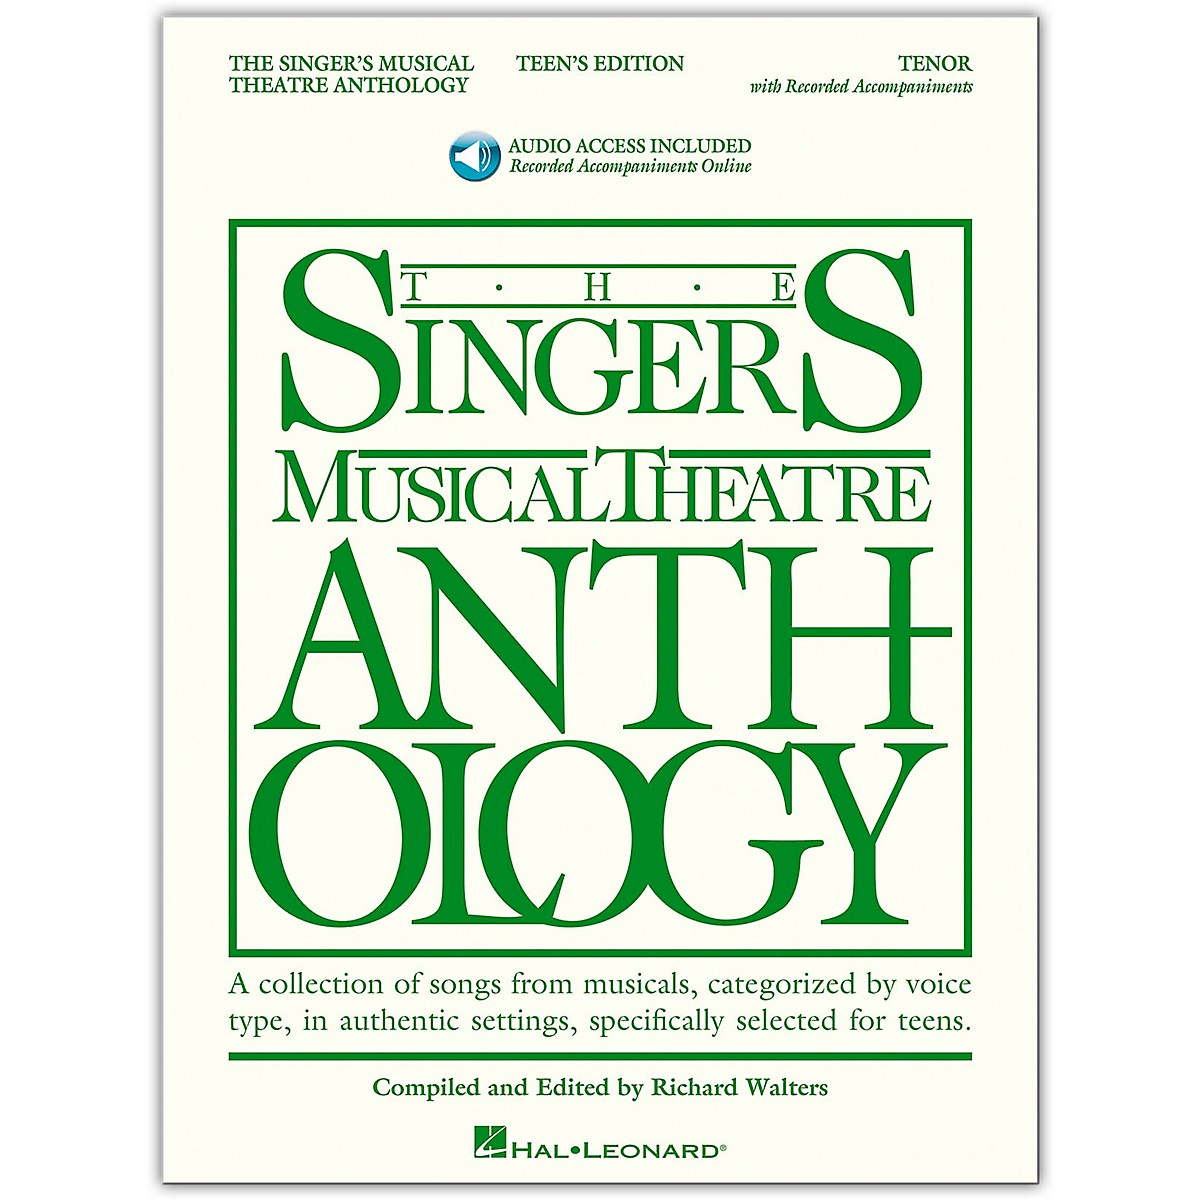 Hal Leonard Singer's Musical Theatre Anthology Teen's Edition Tenor Book/Online Audio